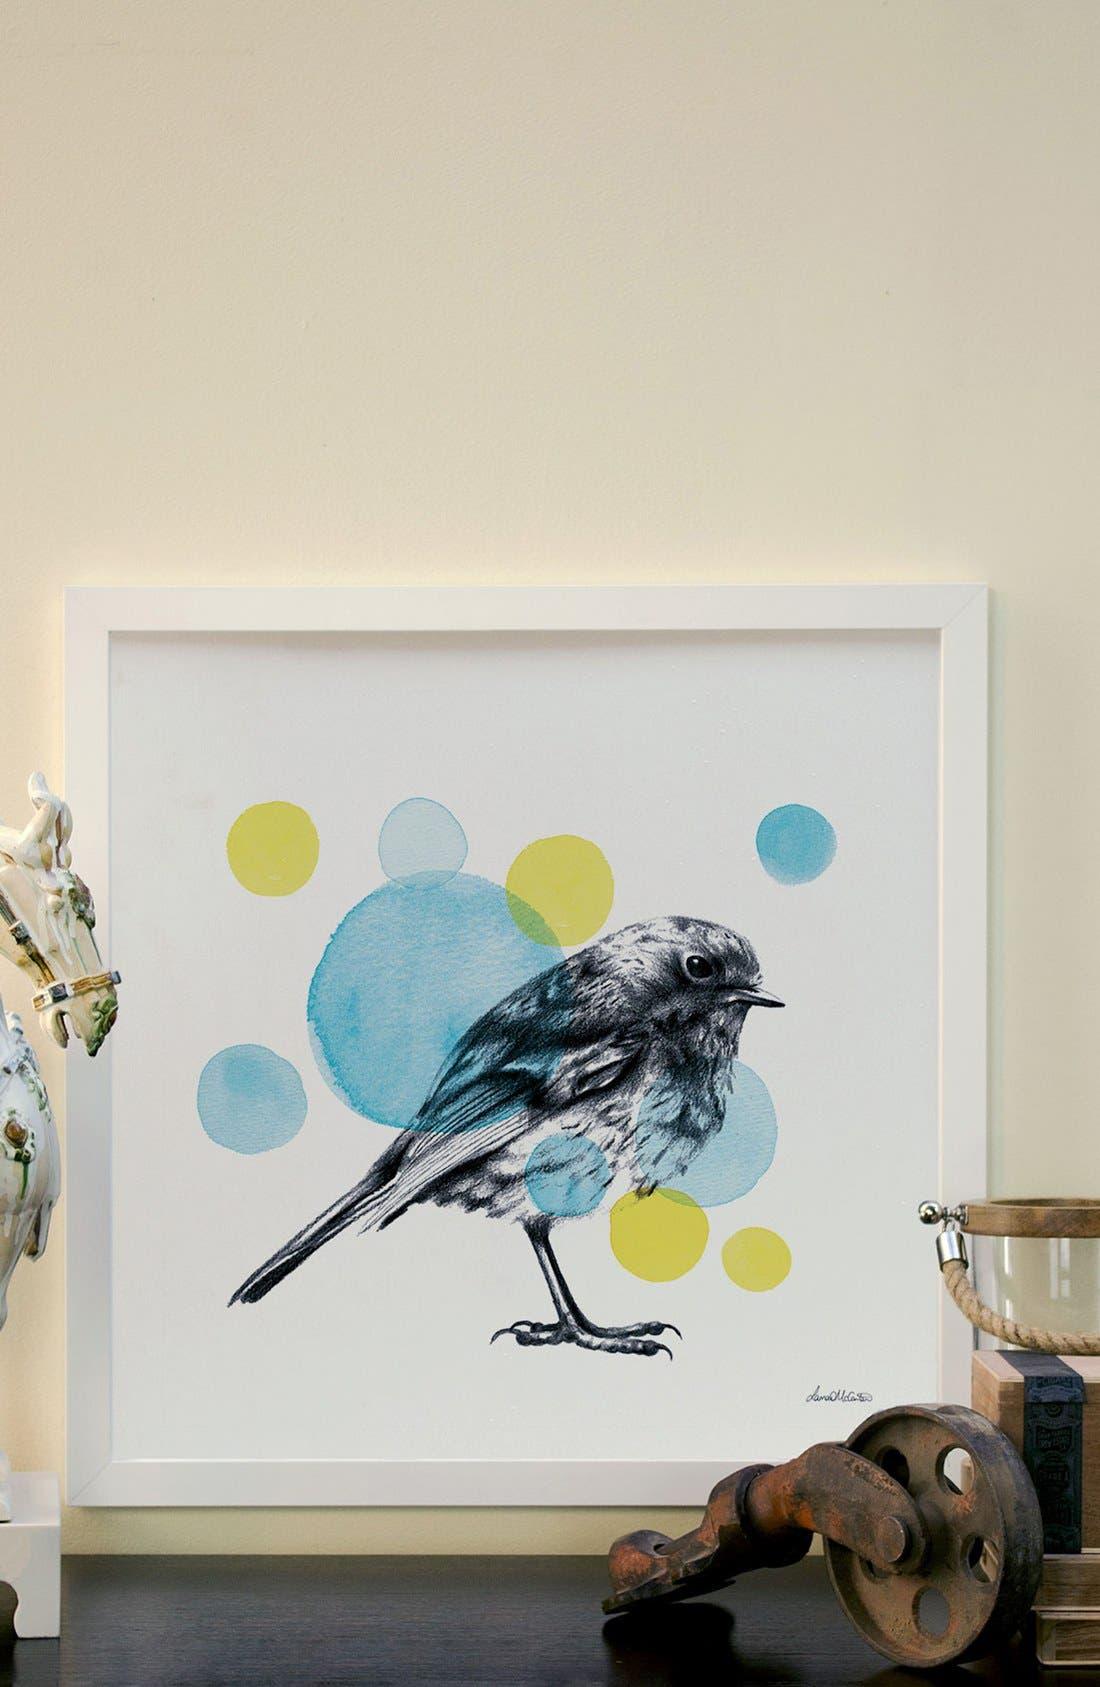 'Sketchbook - Bird' Giclée Print Framed Canvas Art,                             Alternate thumbnail 2, color,                             WHITE